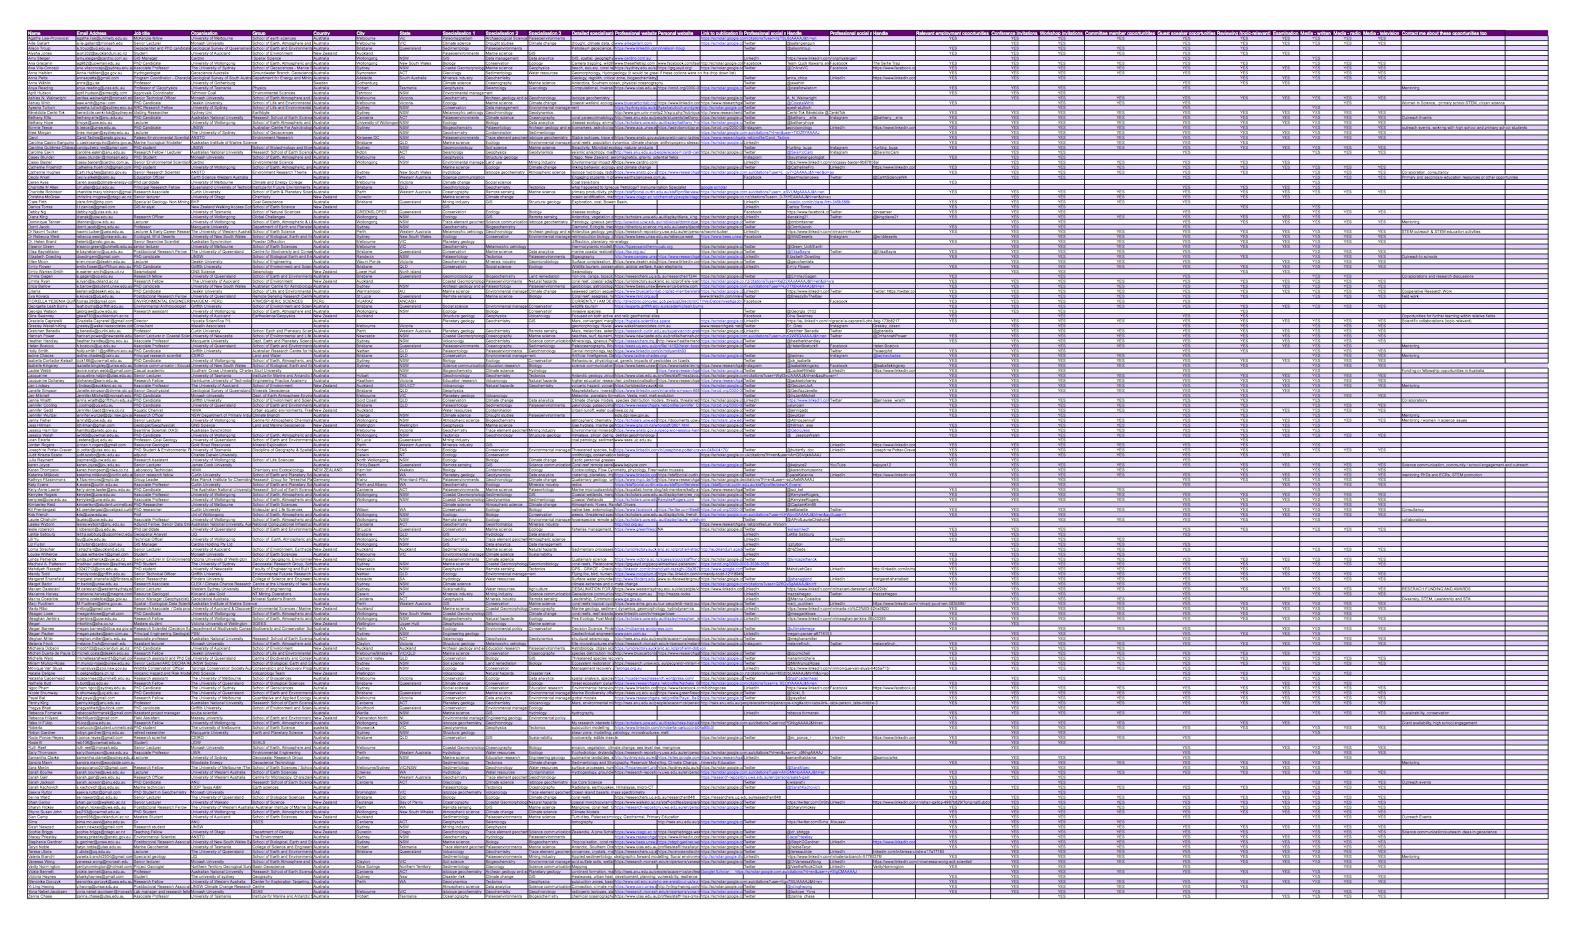 WOMEESA Database